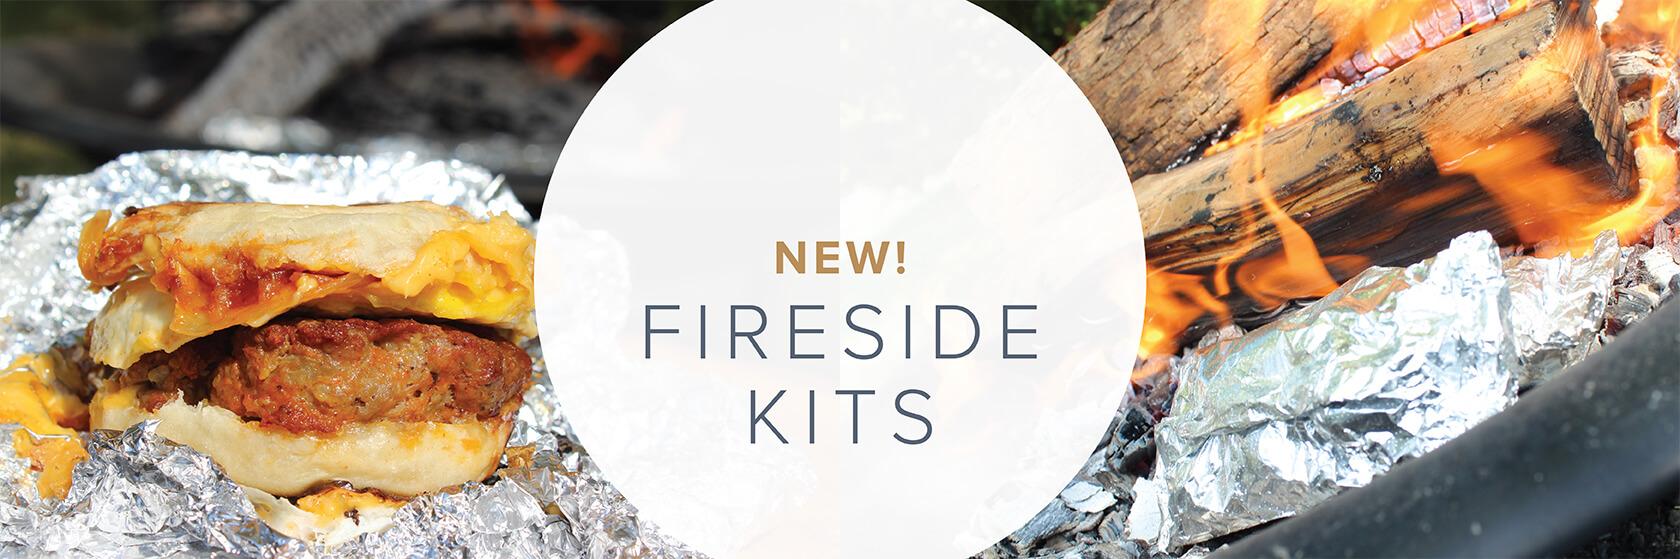 Fireside Kits